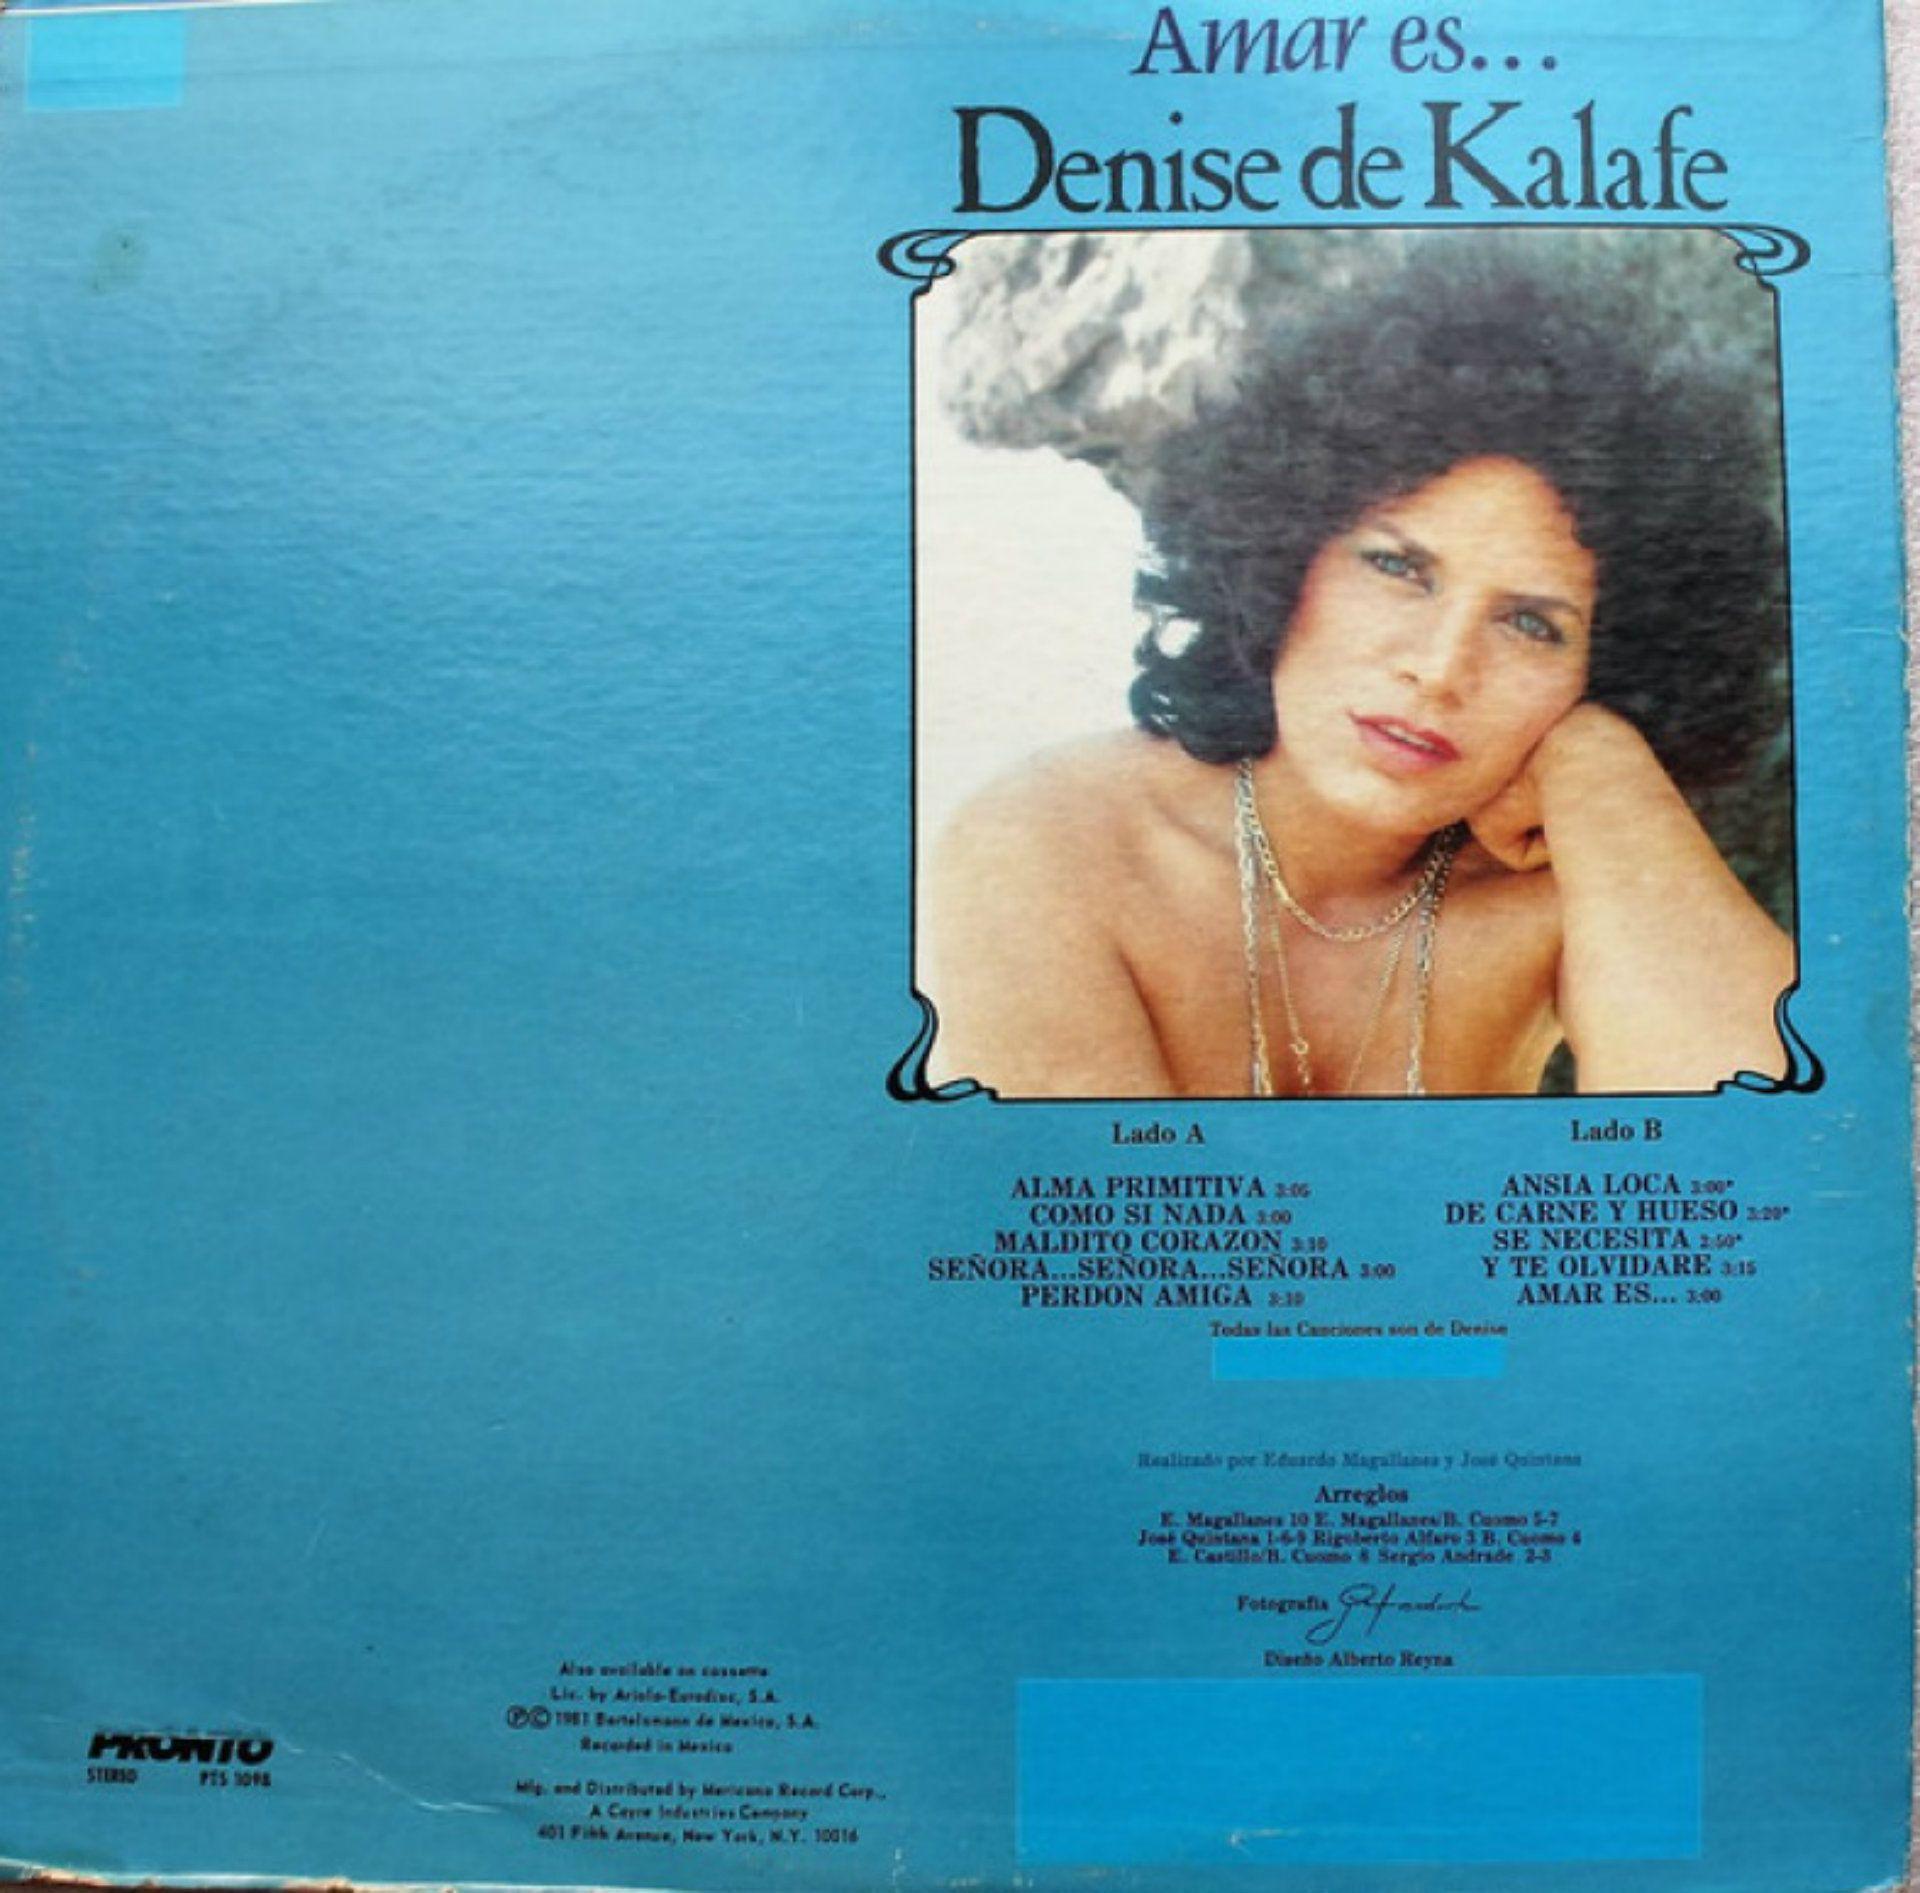 El disco en el que apareció el famoso tema